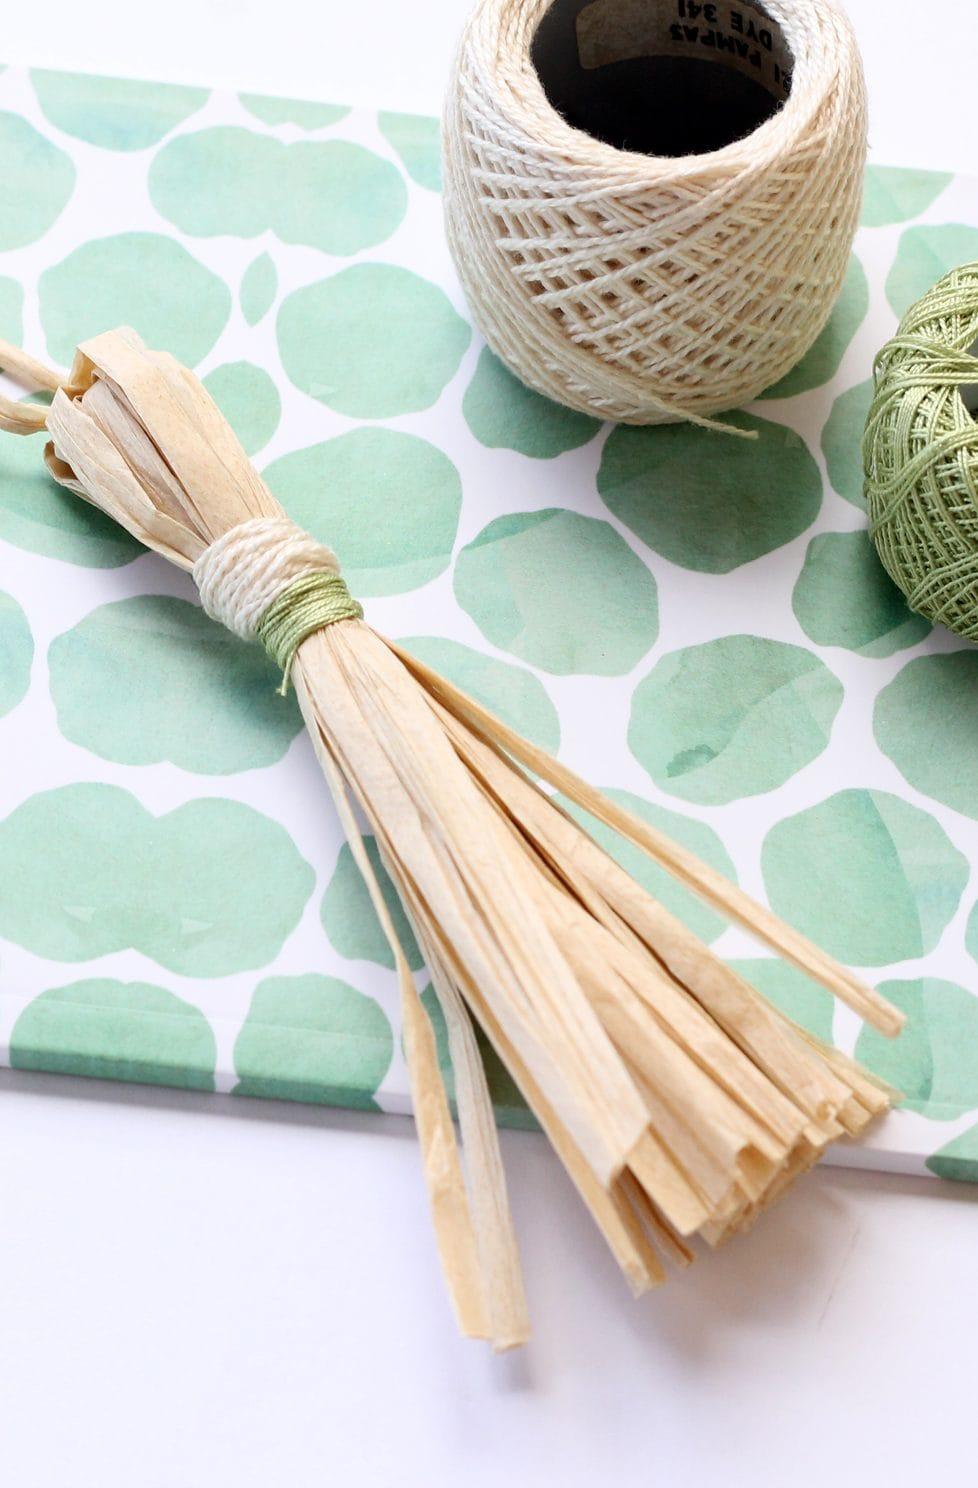 How To Make Tassels